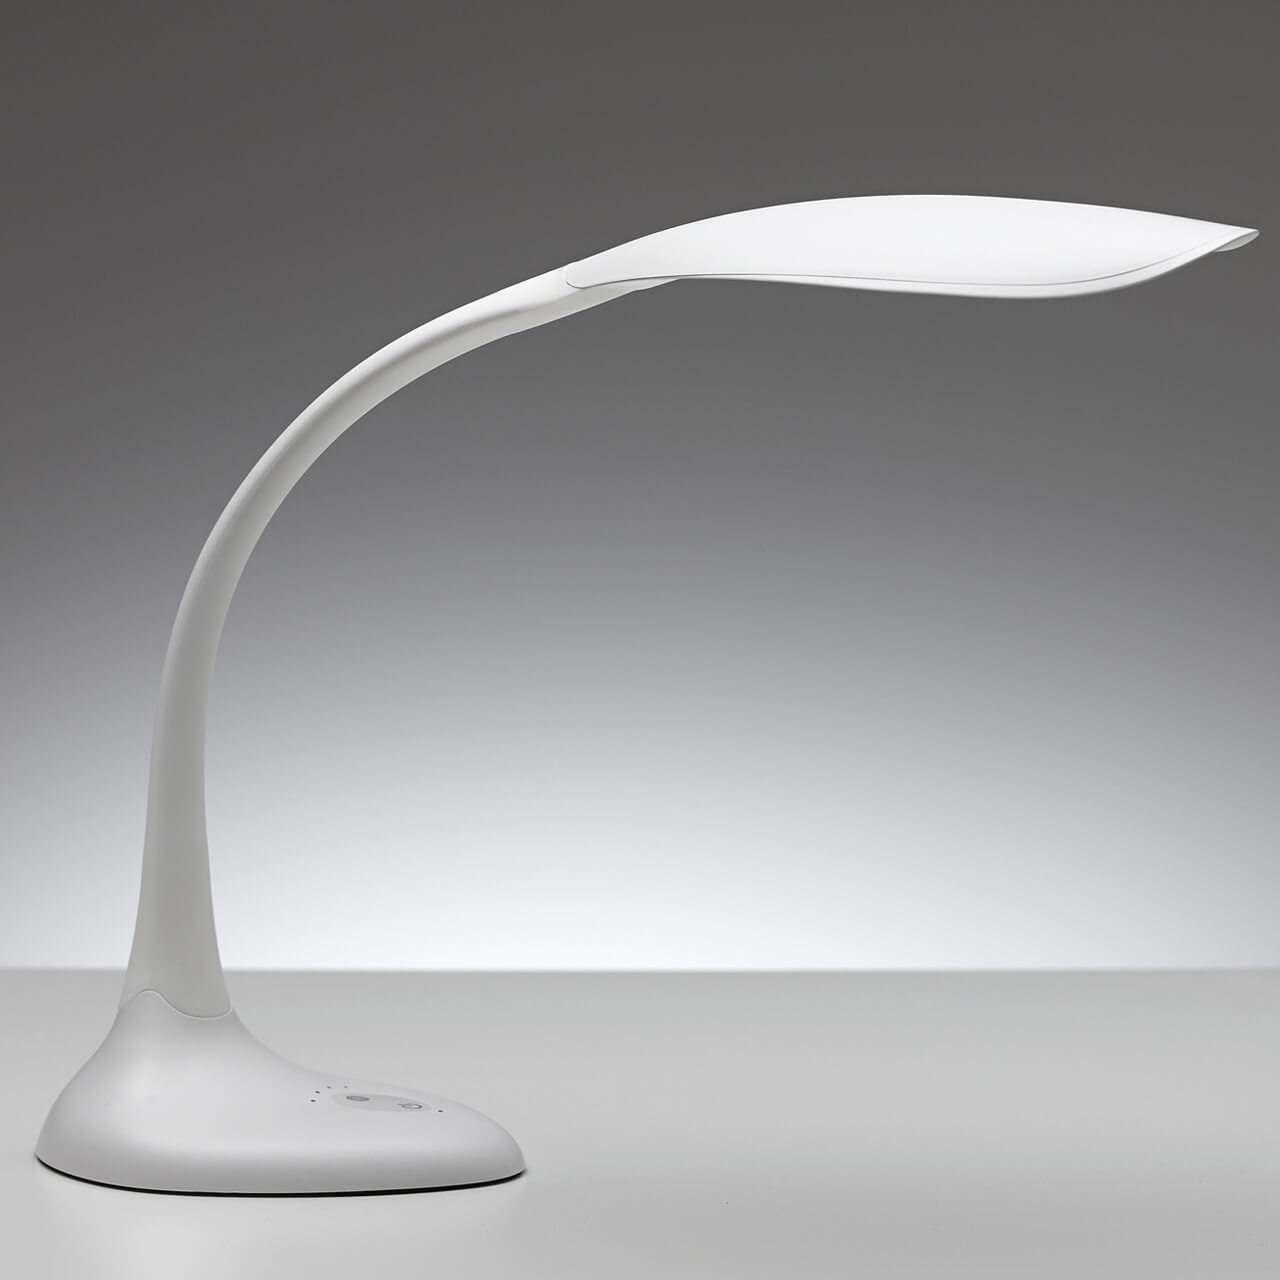 Ergodesk flexlite met tafelvoet wit led verlichting ERKAVLFL01 0003s 0003 Omgeving